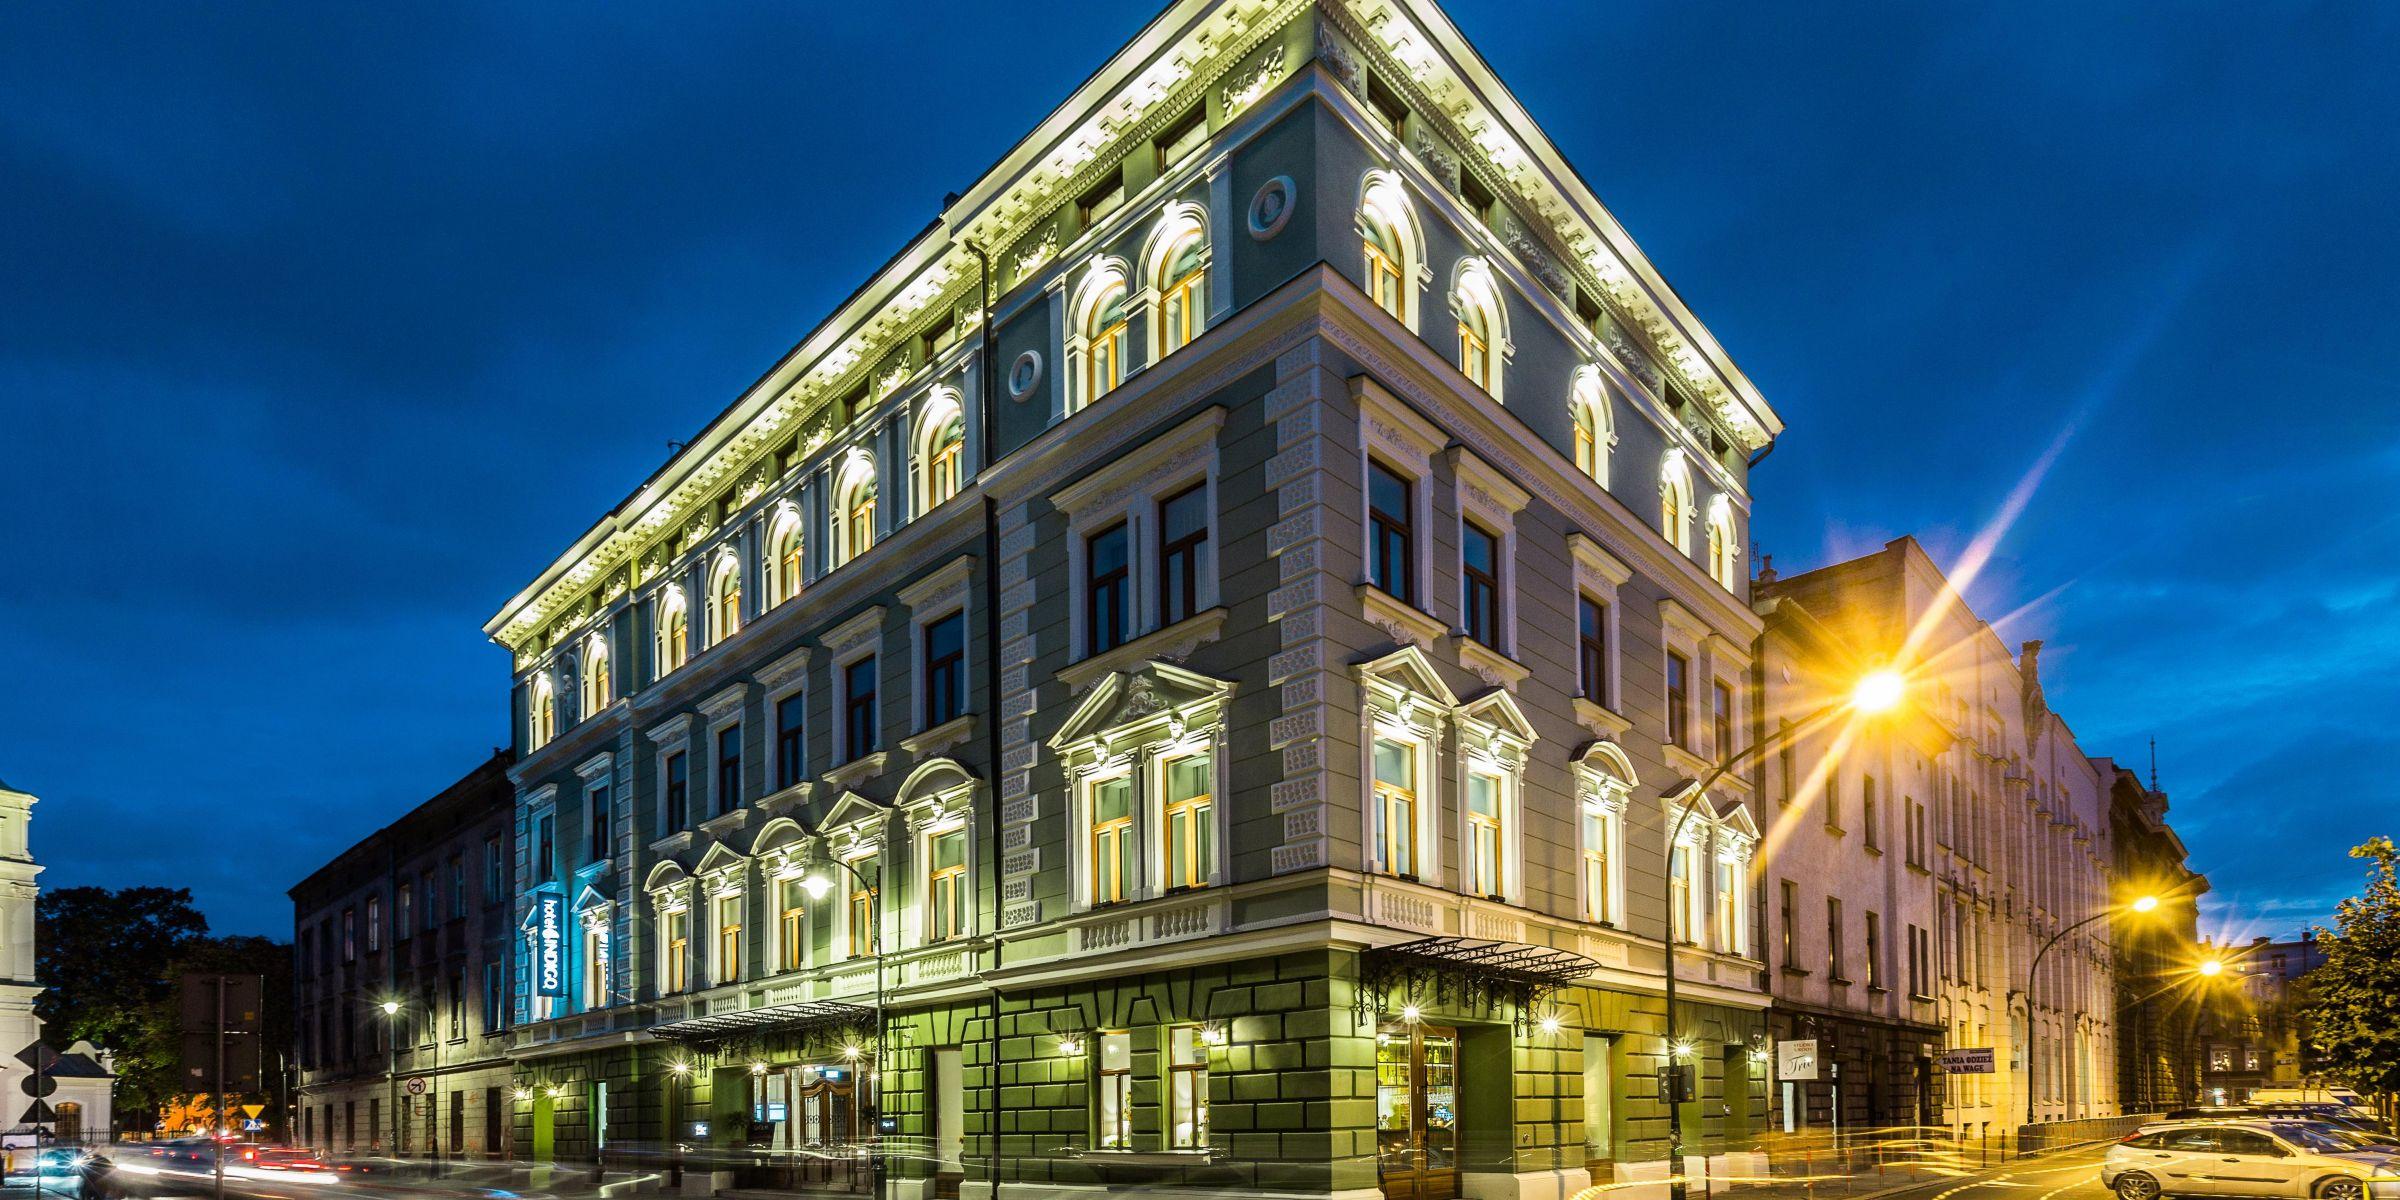 Hotel Indigo Krakow Old Town